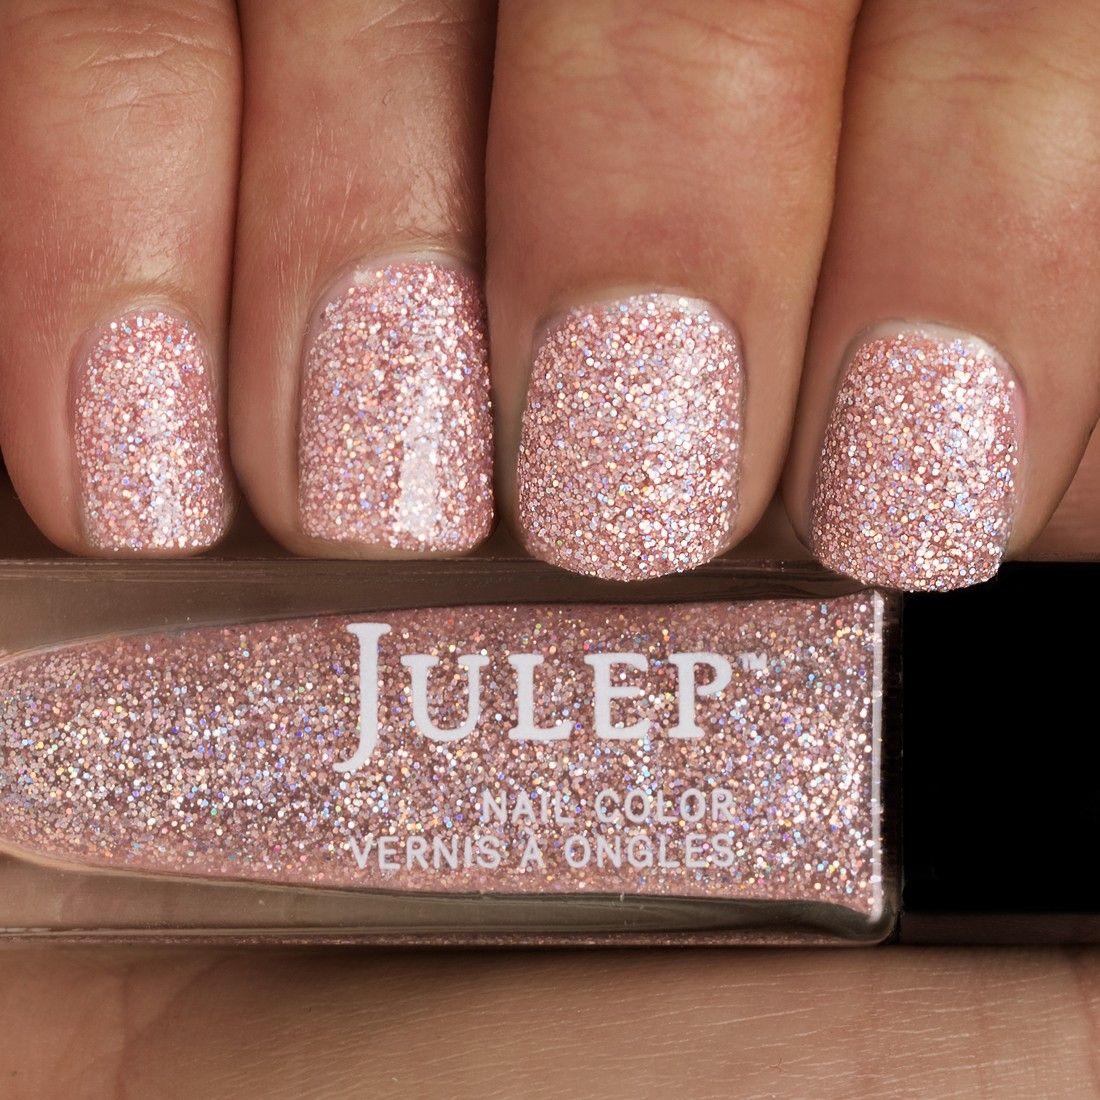 Pink And Blue Glitter Nail Polish: Blushing Holographic Full-coverage Glitter